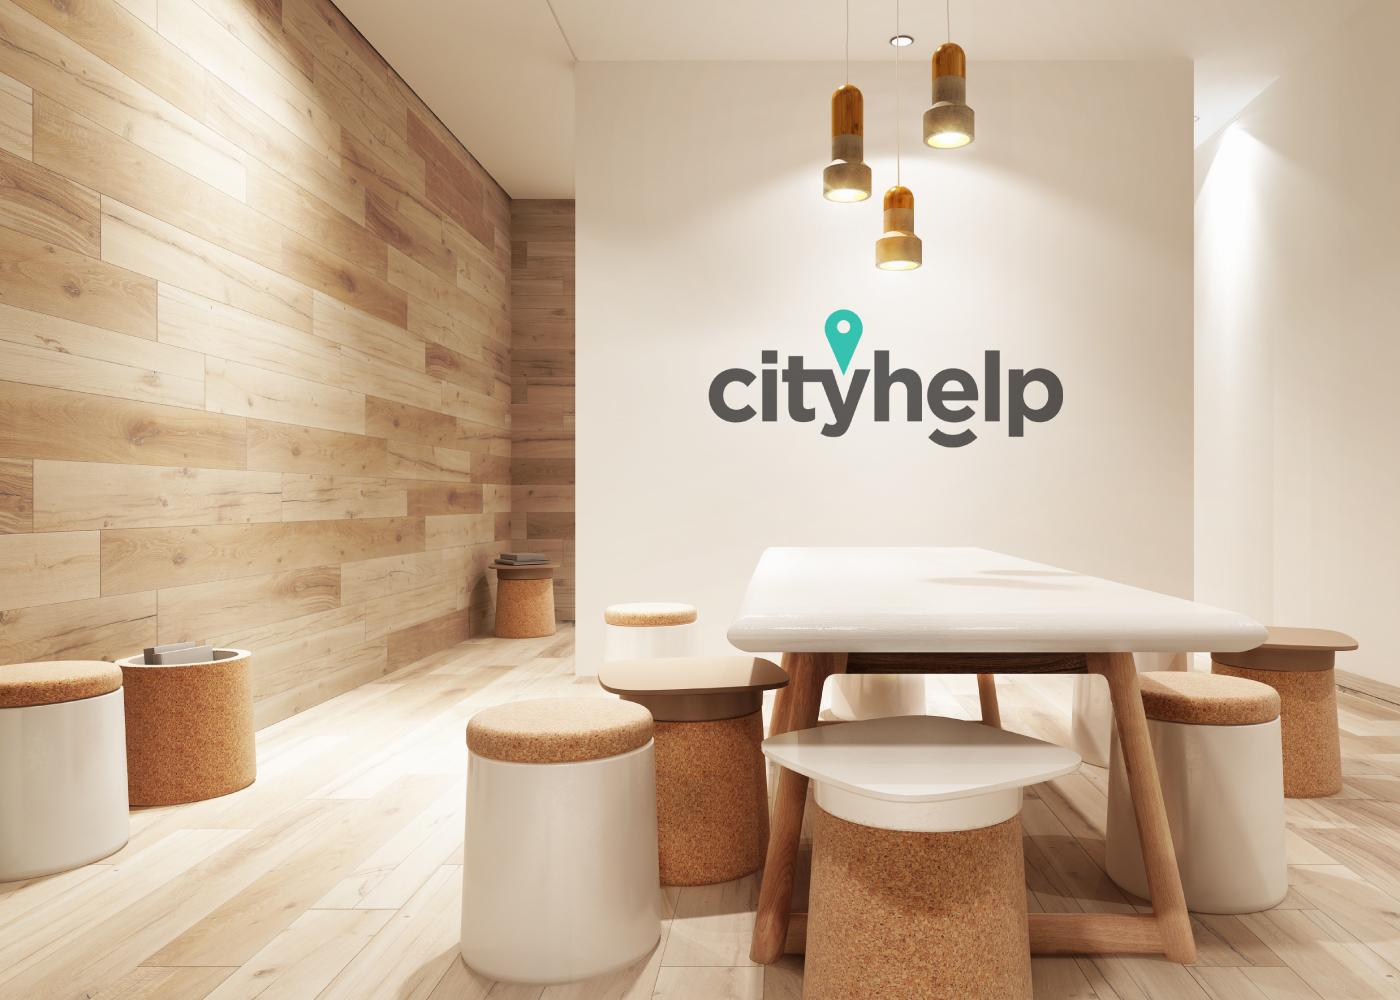 cityhelp-marca-logotipo-rotulo